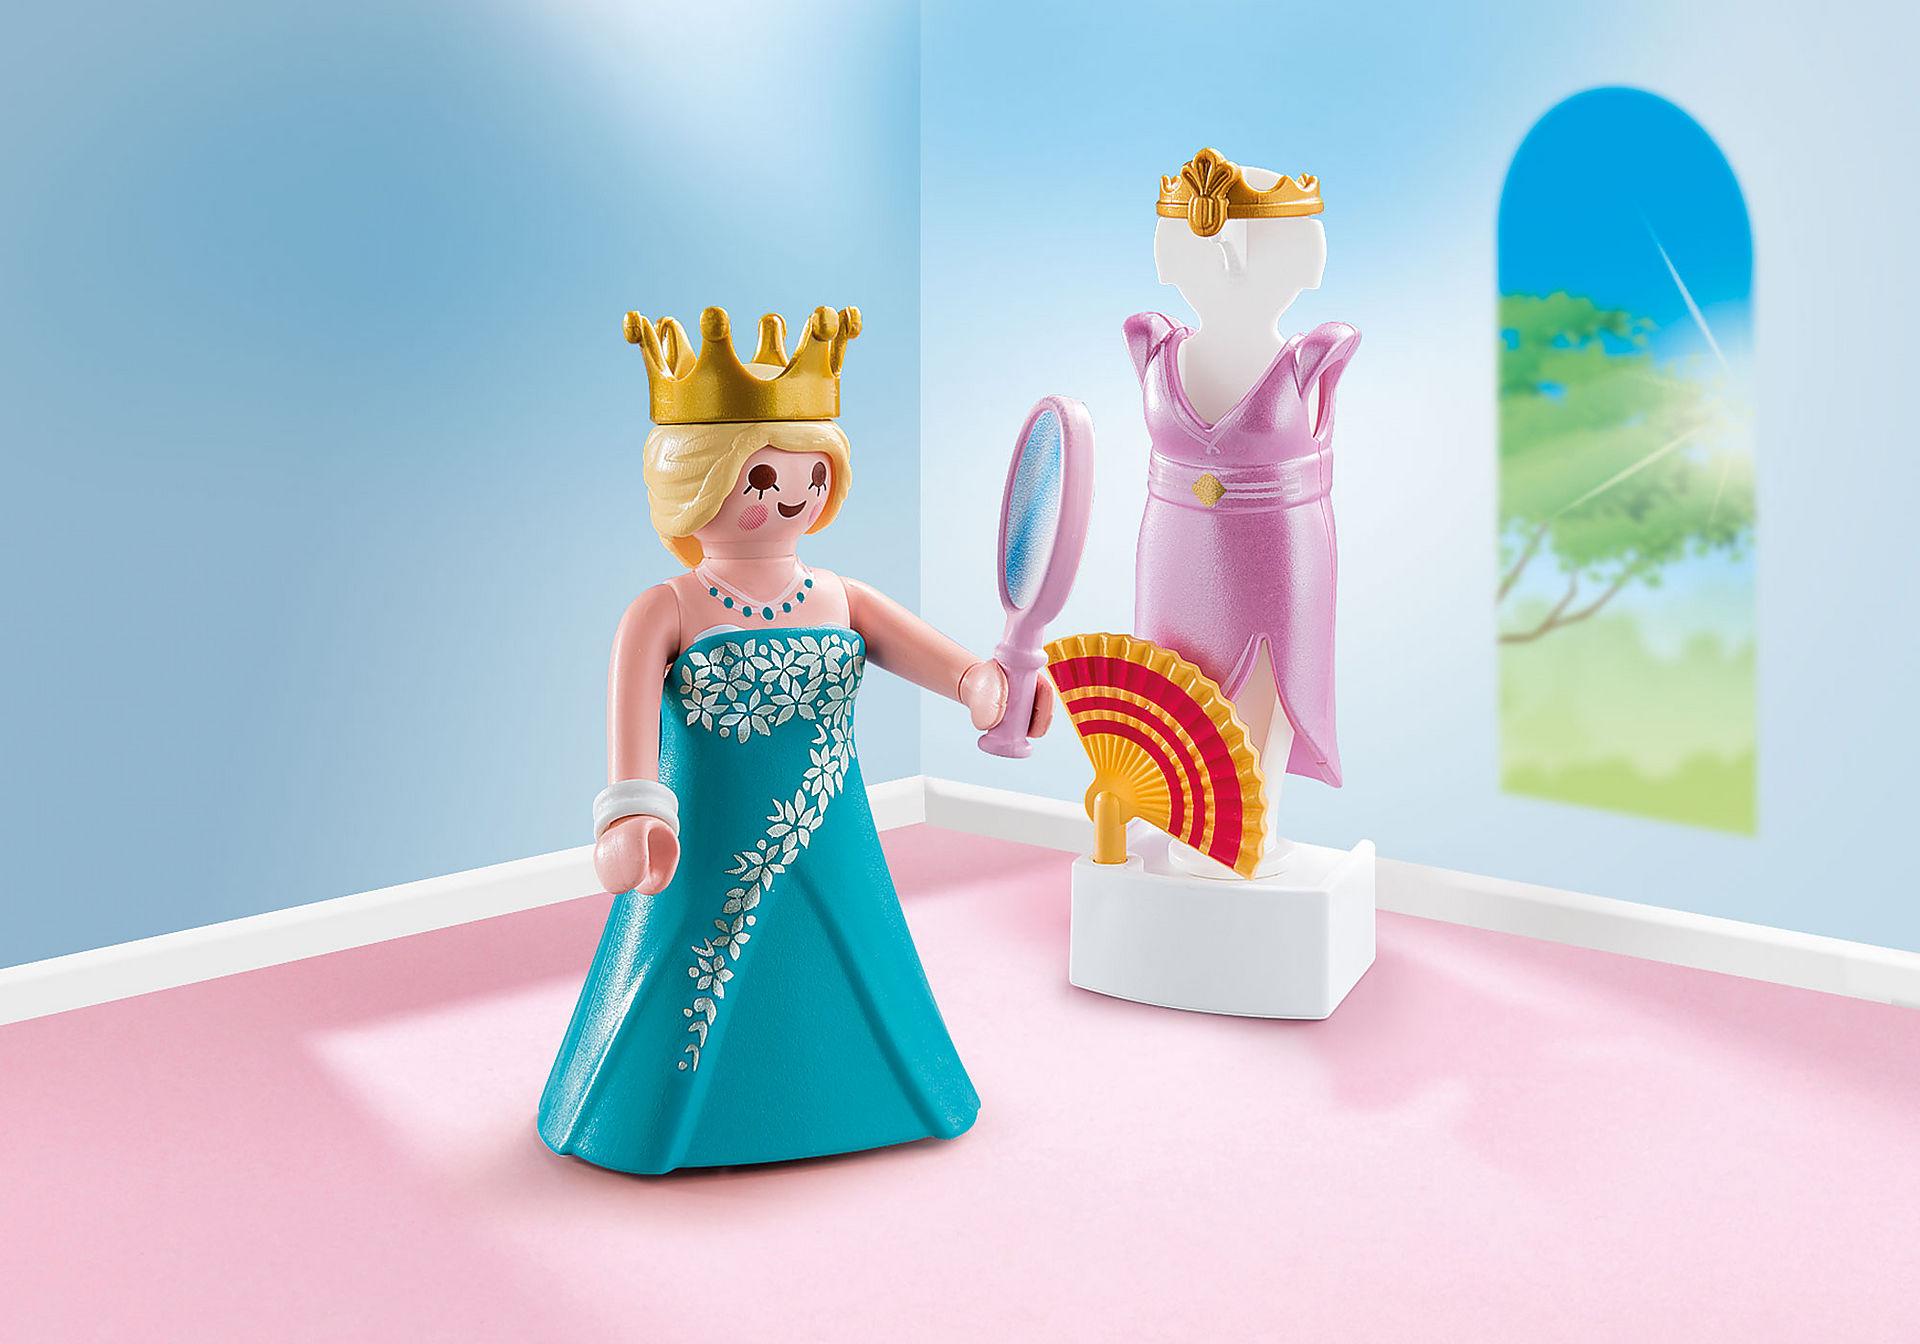 70153 Princesse avec mannequin zoom image1